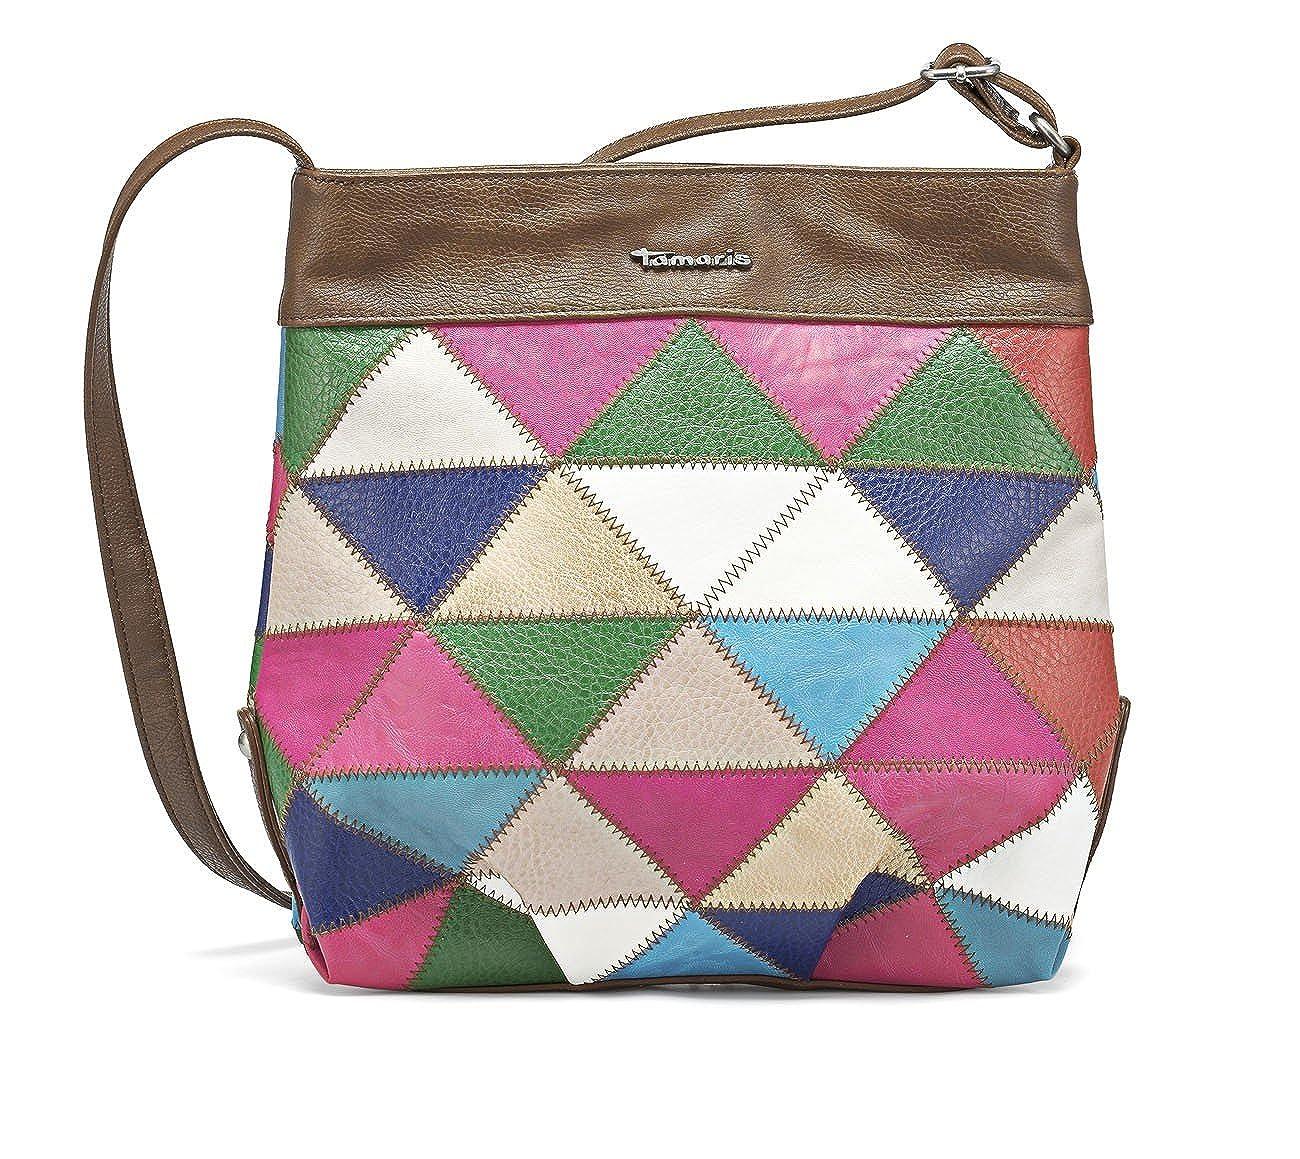 TAMARIS Handtasche, Umhängetasche, Patchwork Look, 3 Farben